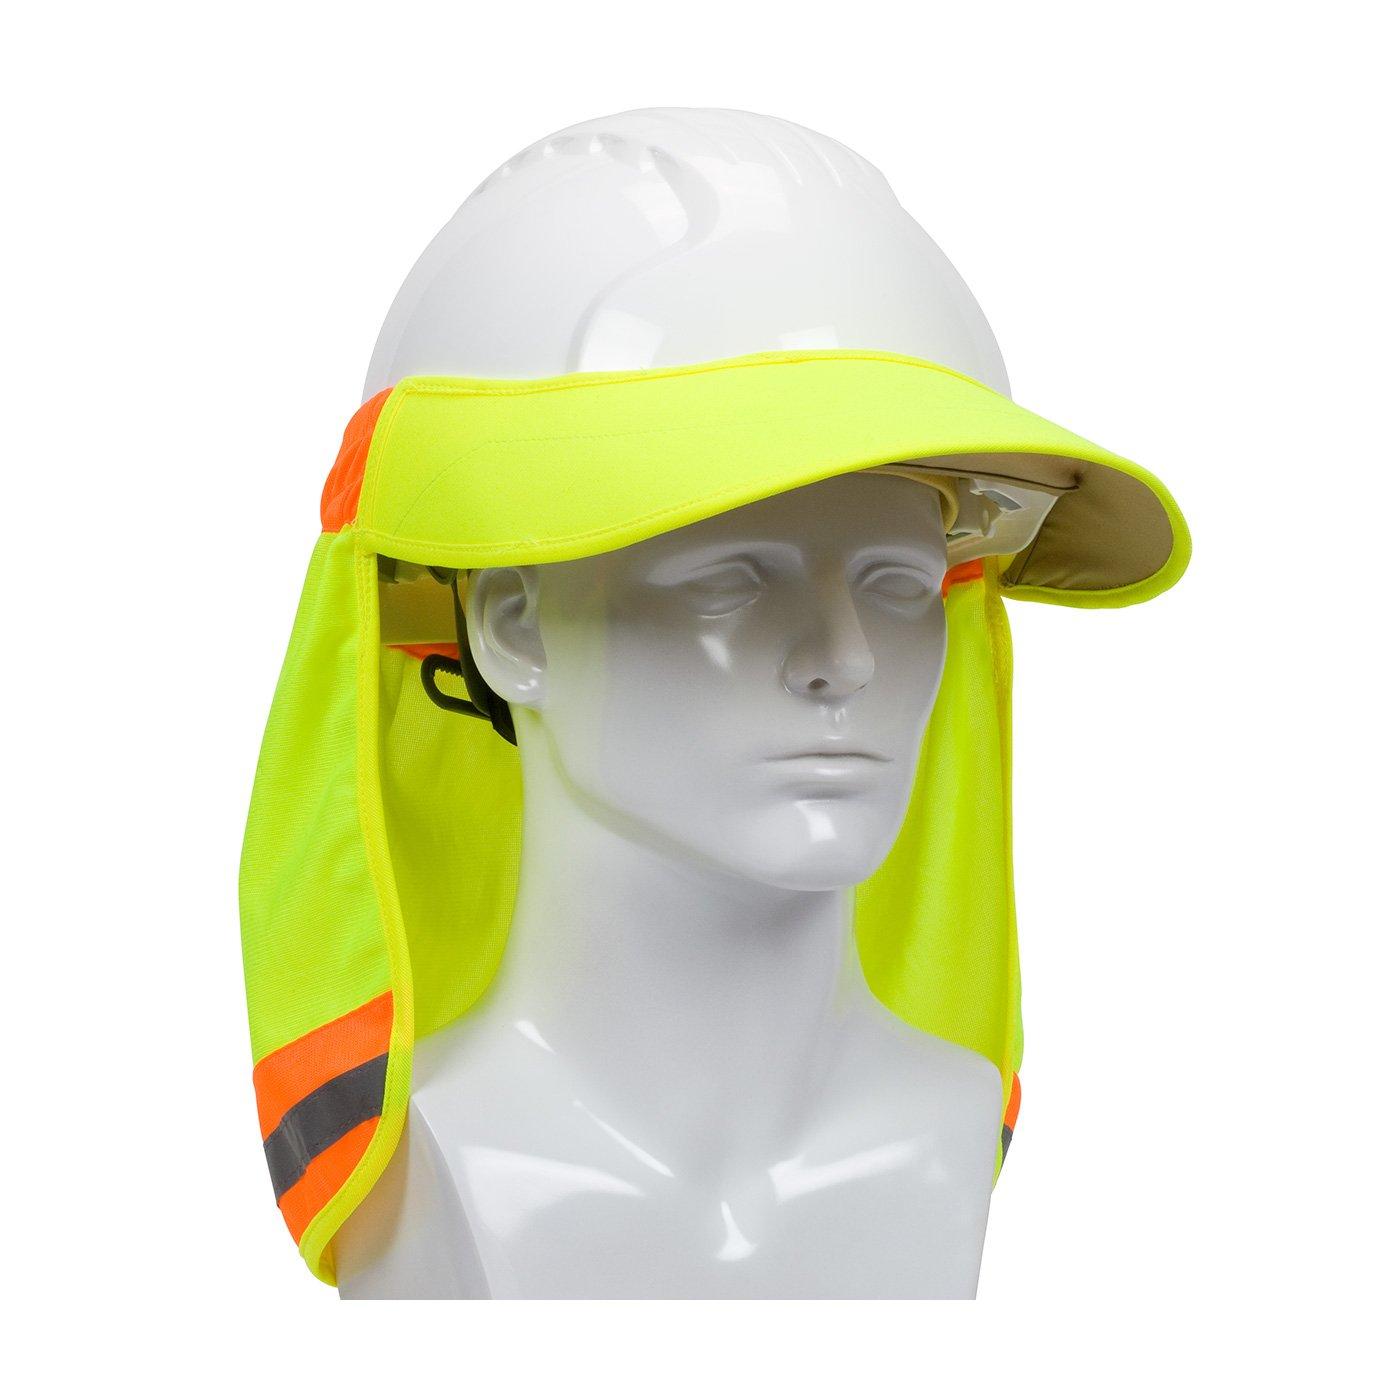 EZ-Cool 396-800-YEL Hi-Vis Hard Hat Neck Sun Shade With Visor fc4e2878ac26